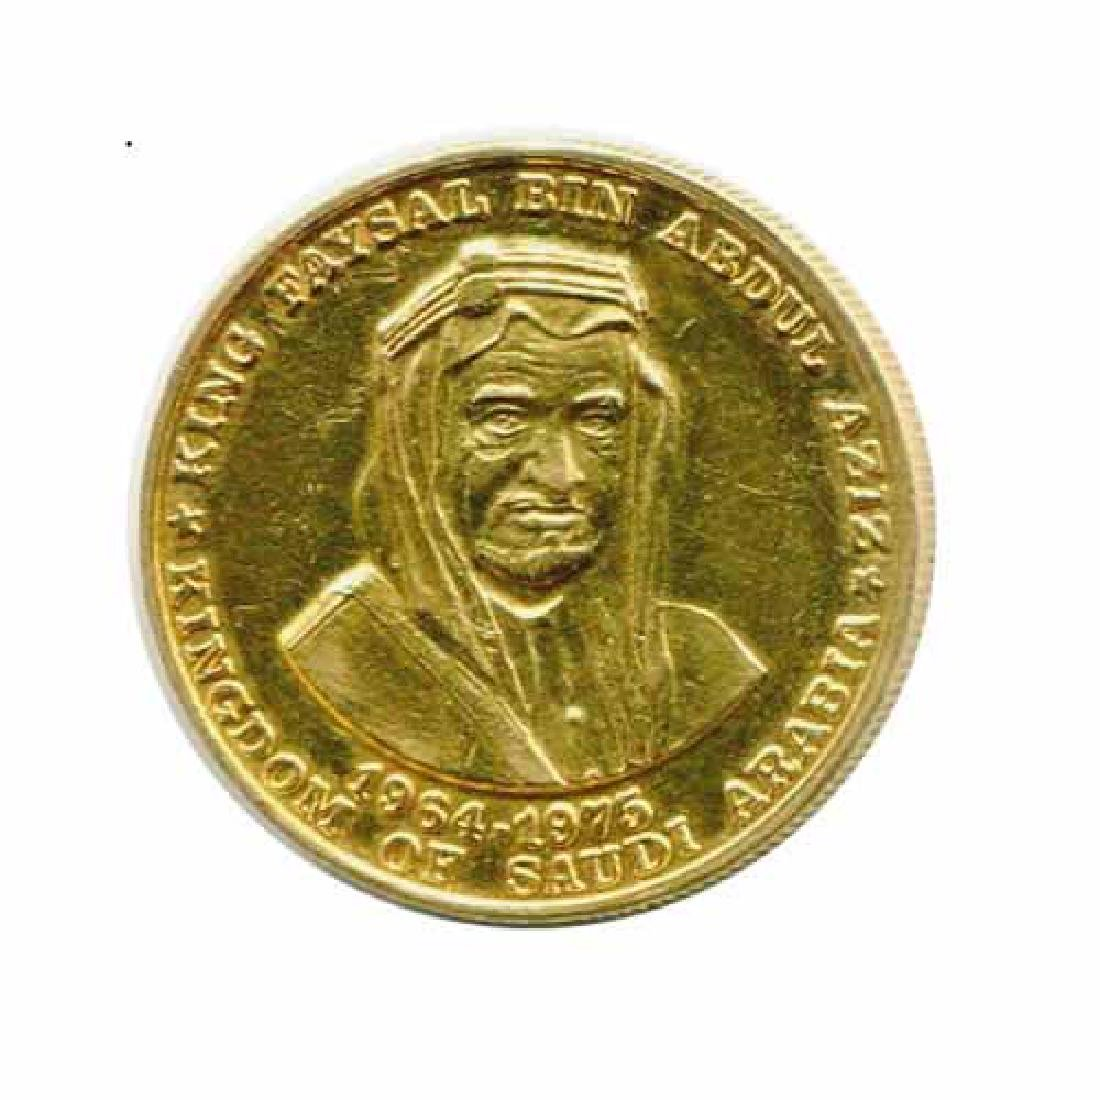 Saudi Arabia Gold Medal 16.1g 1975 Abdul Aziz